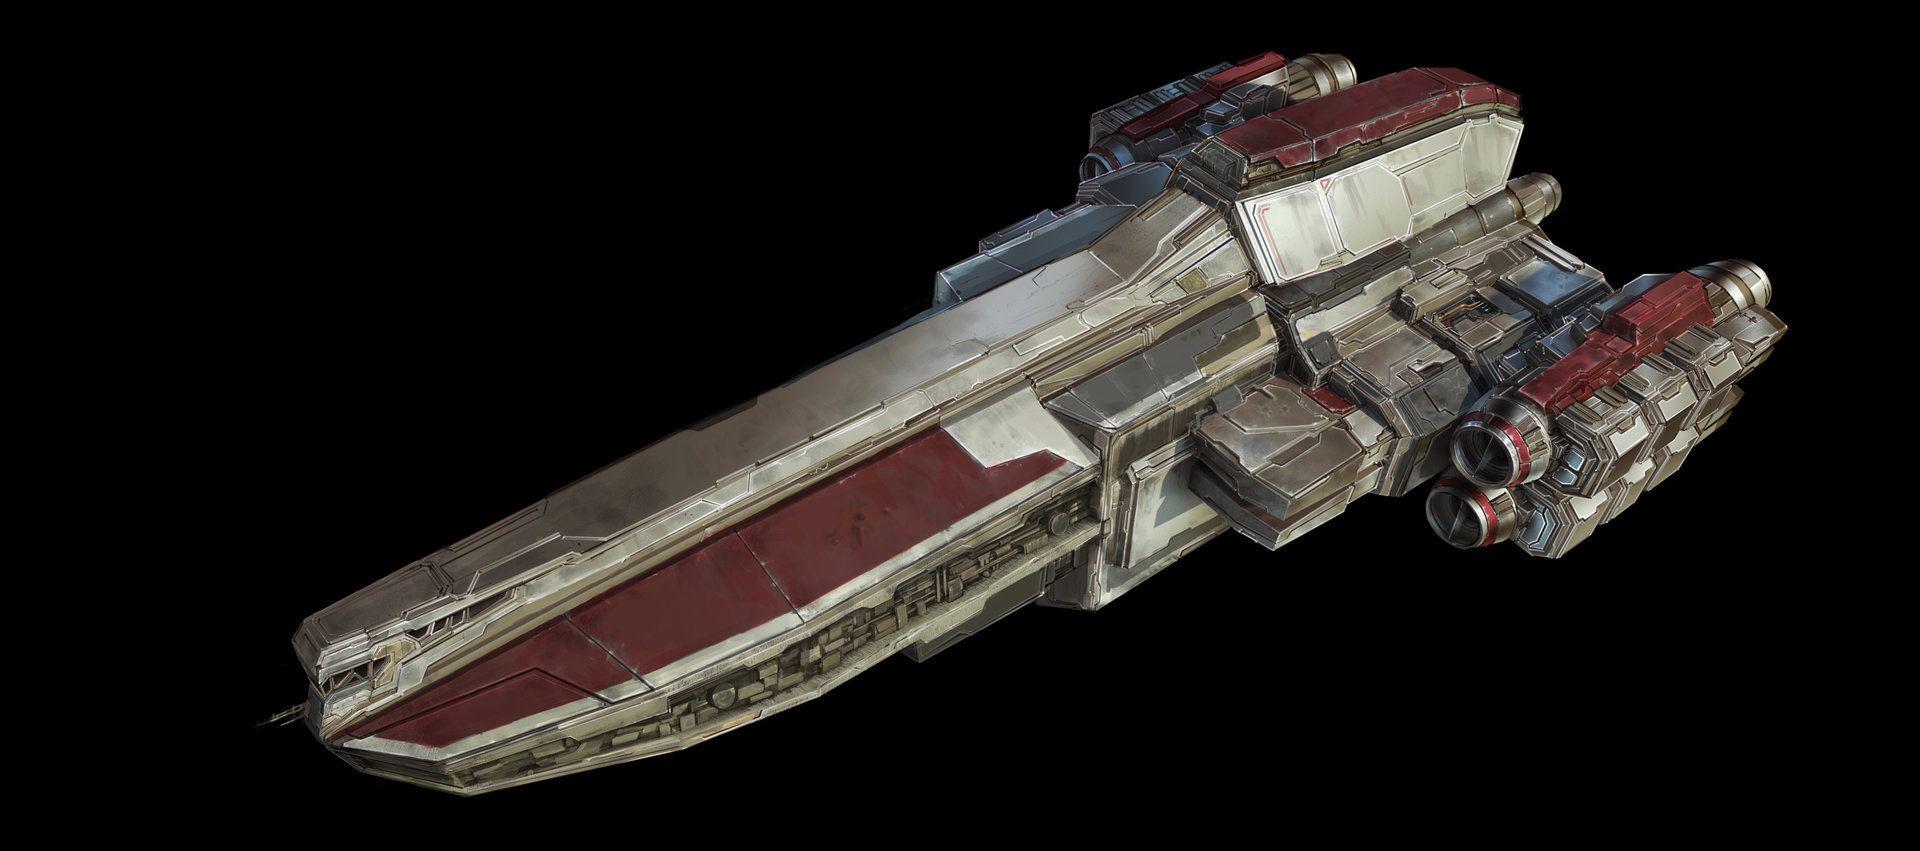 Https Www Artstation Com Artwork Spaceship Concept